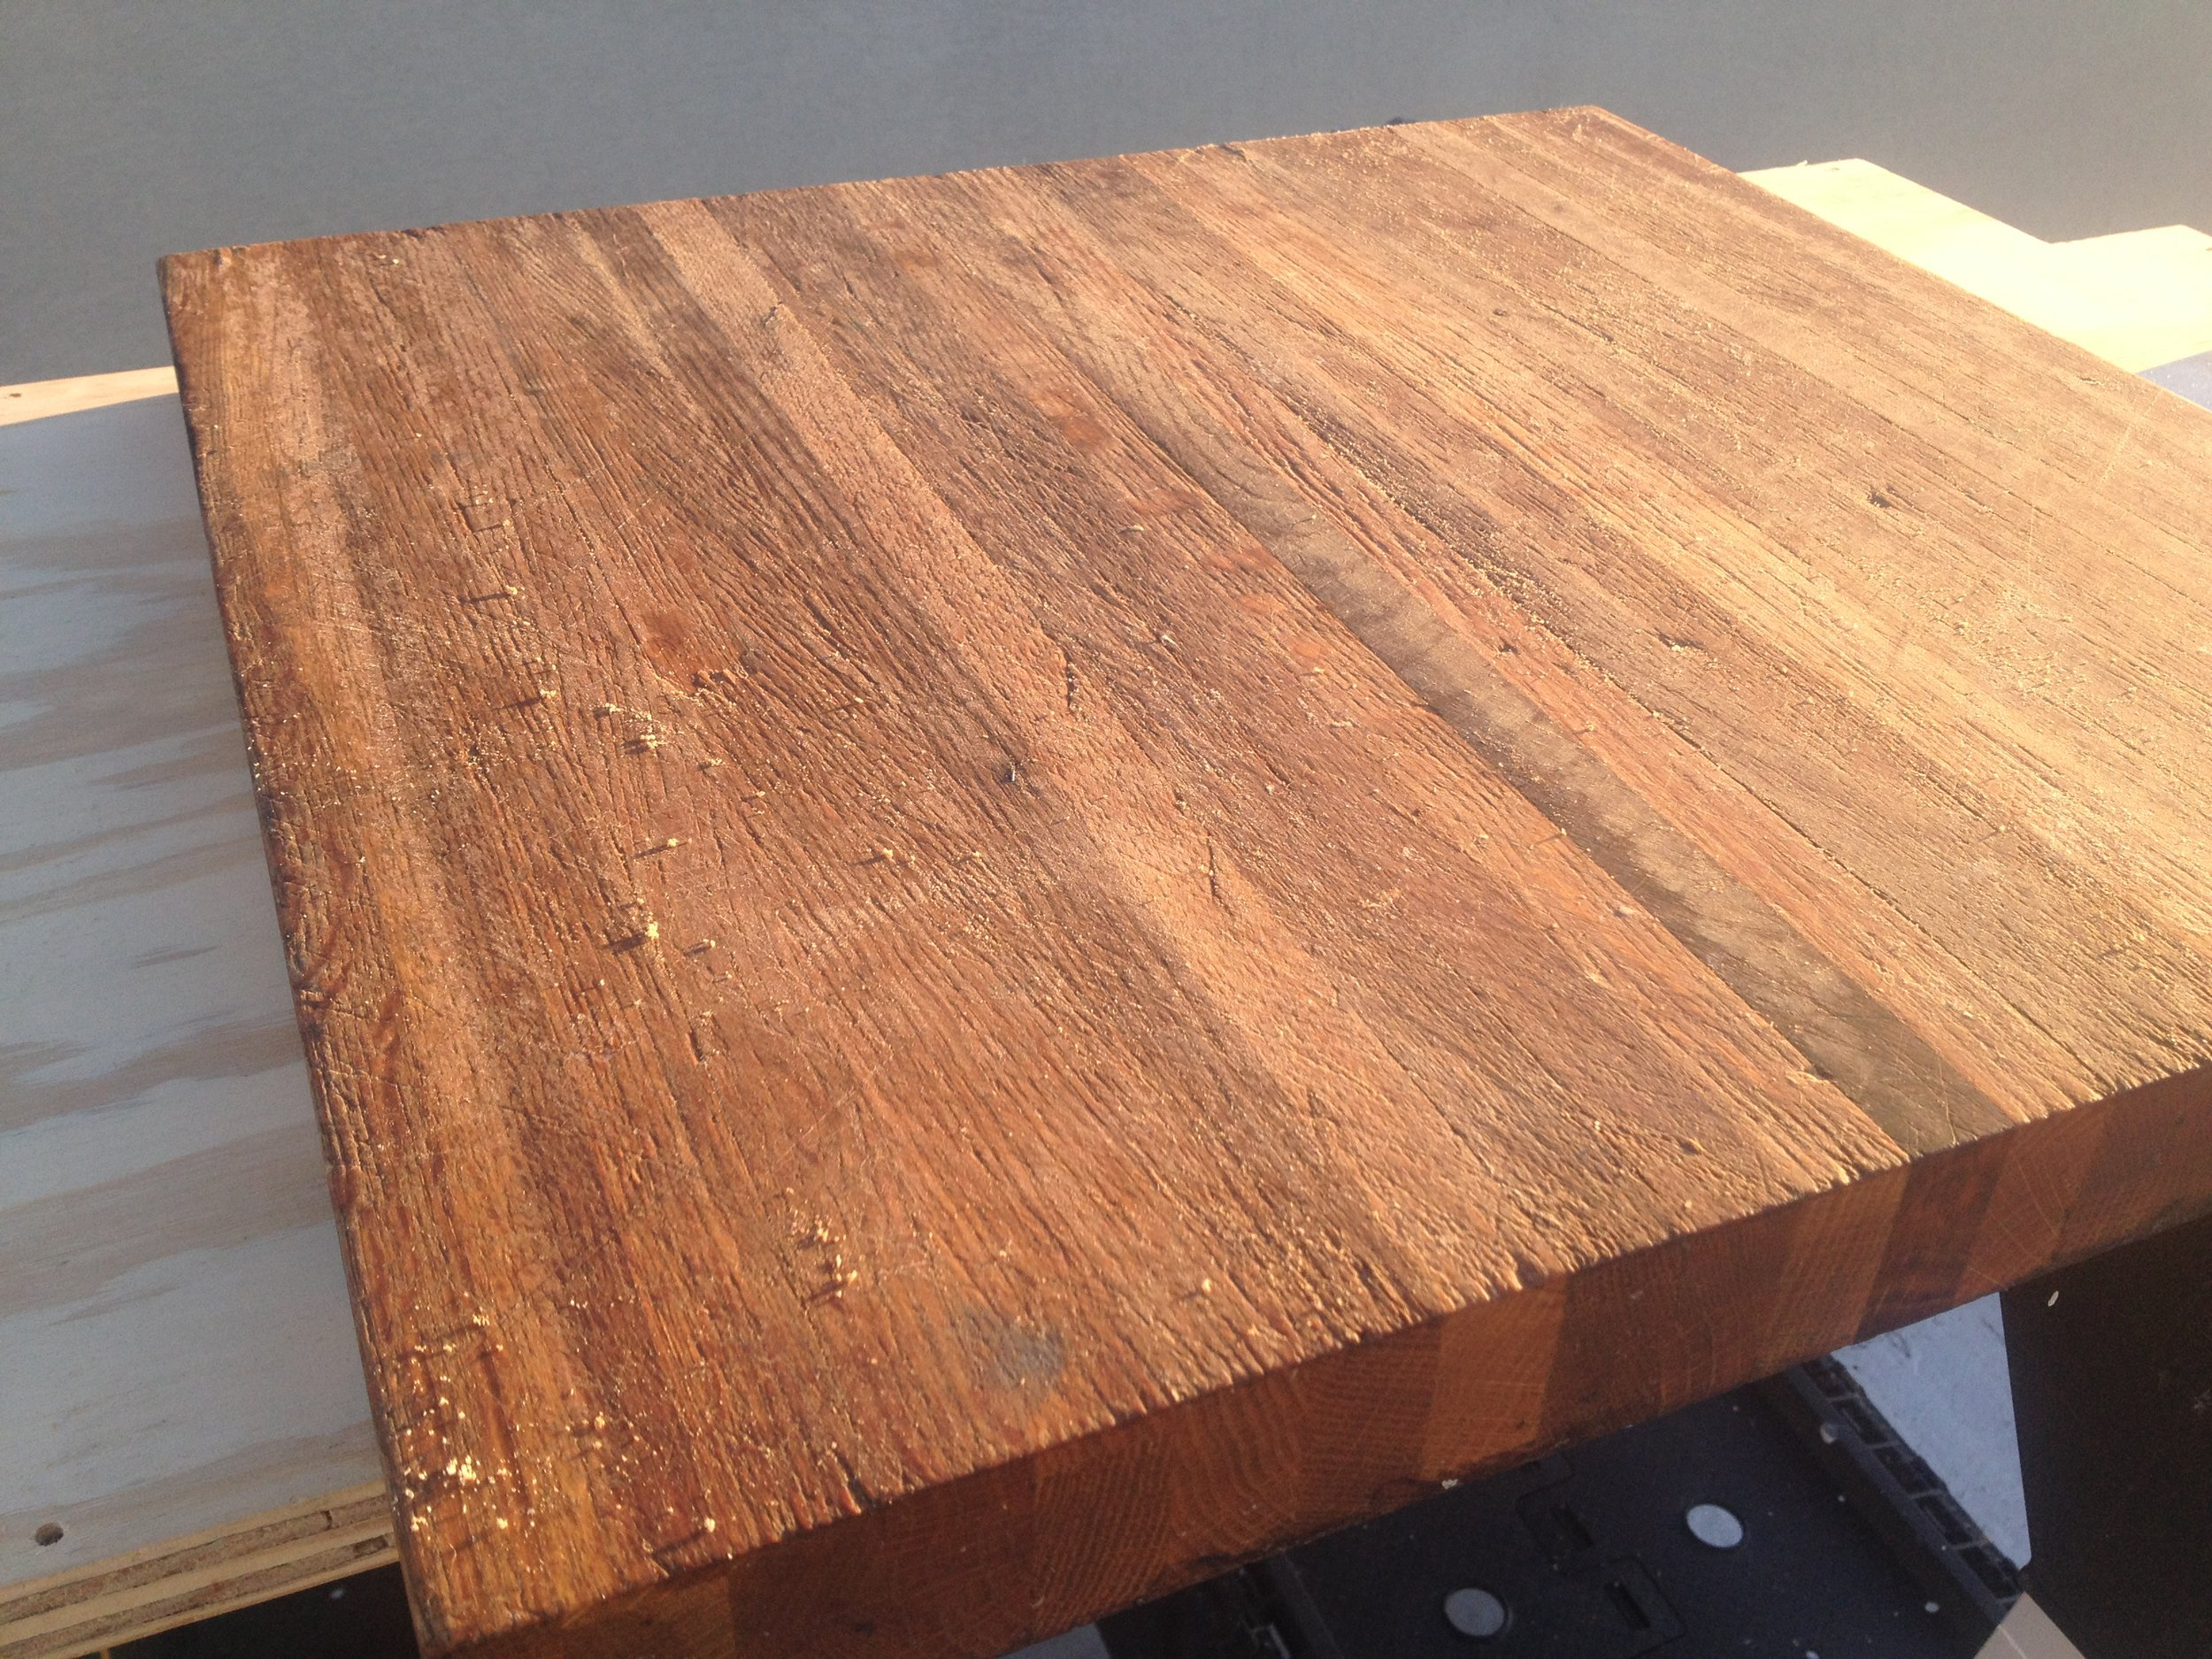 cutting-board-restoration-before-1.jpg